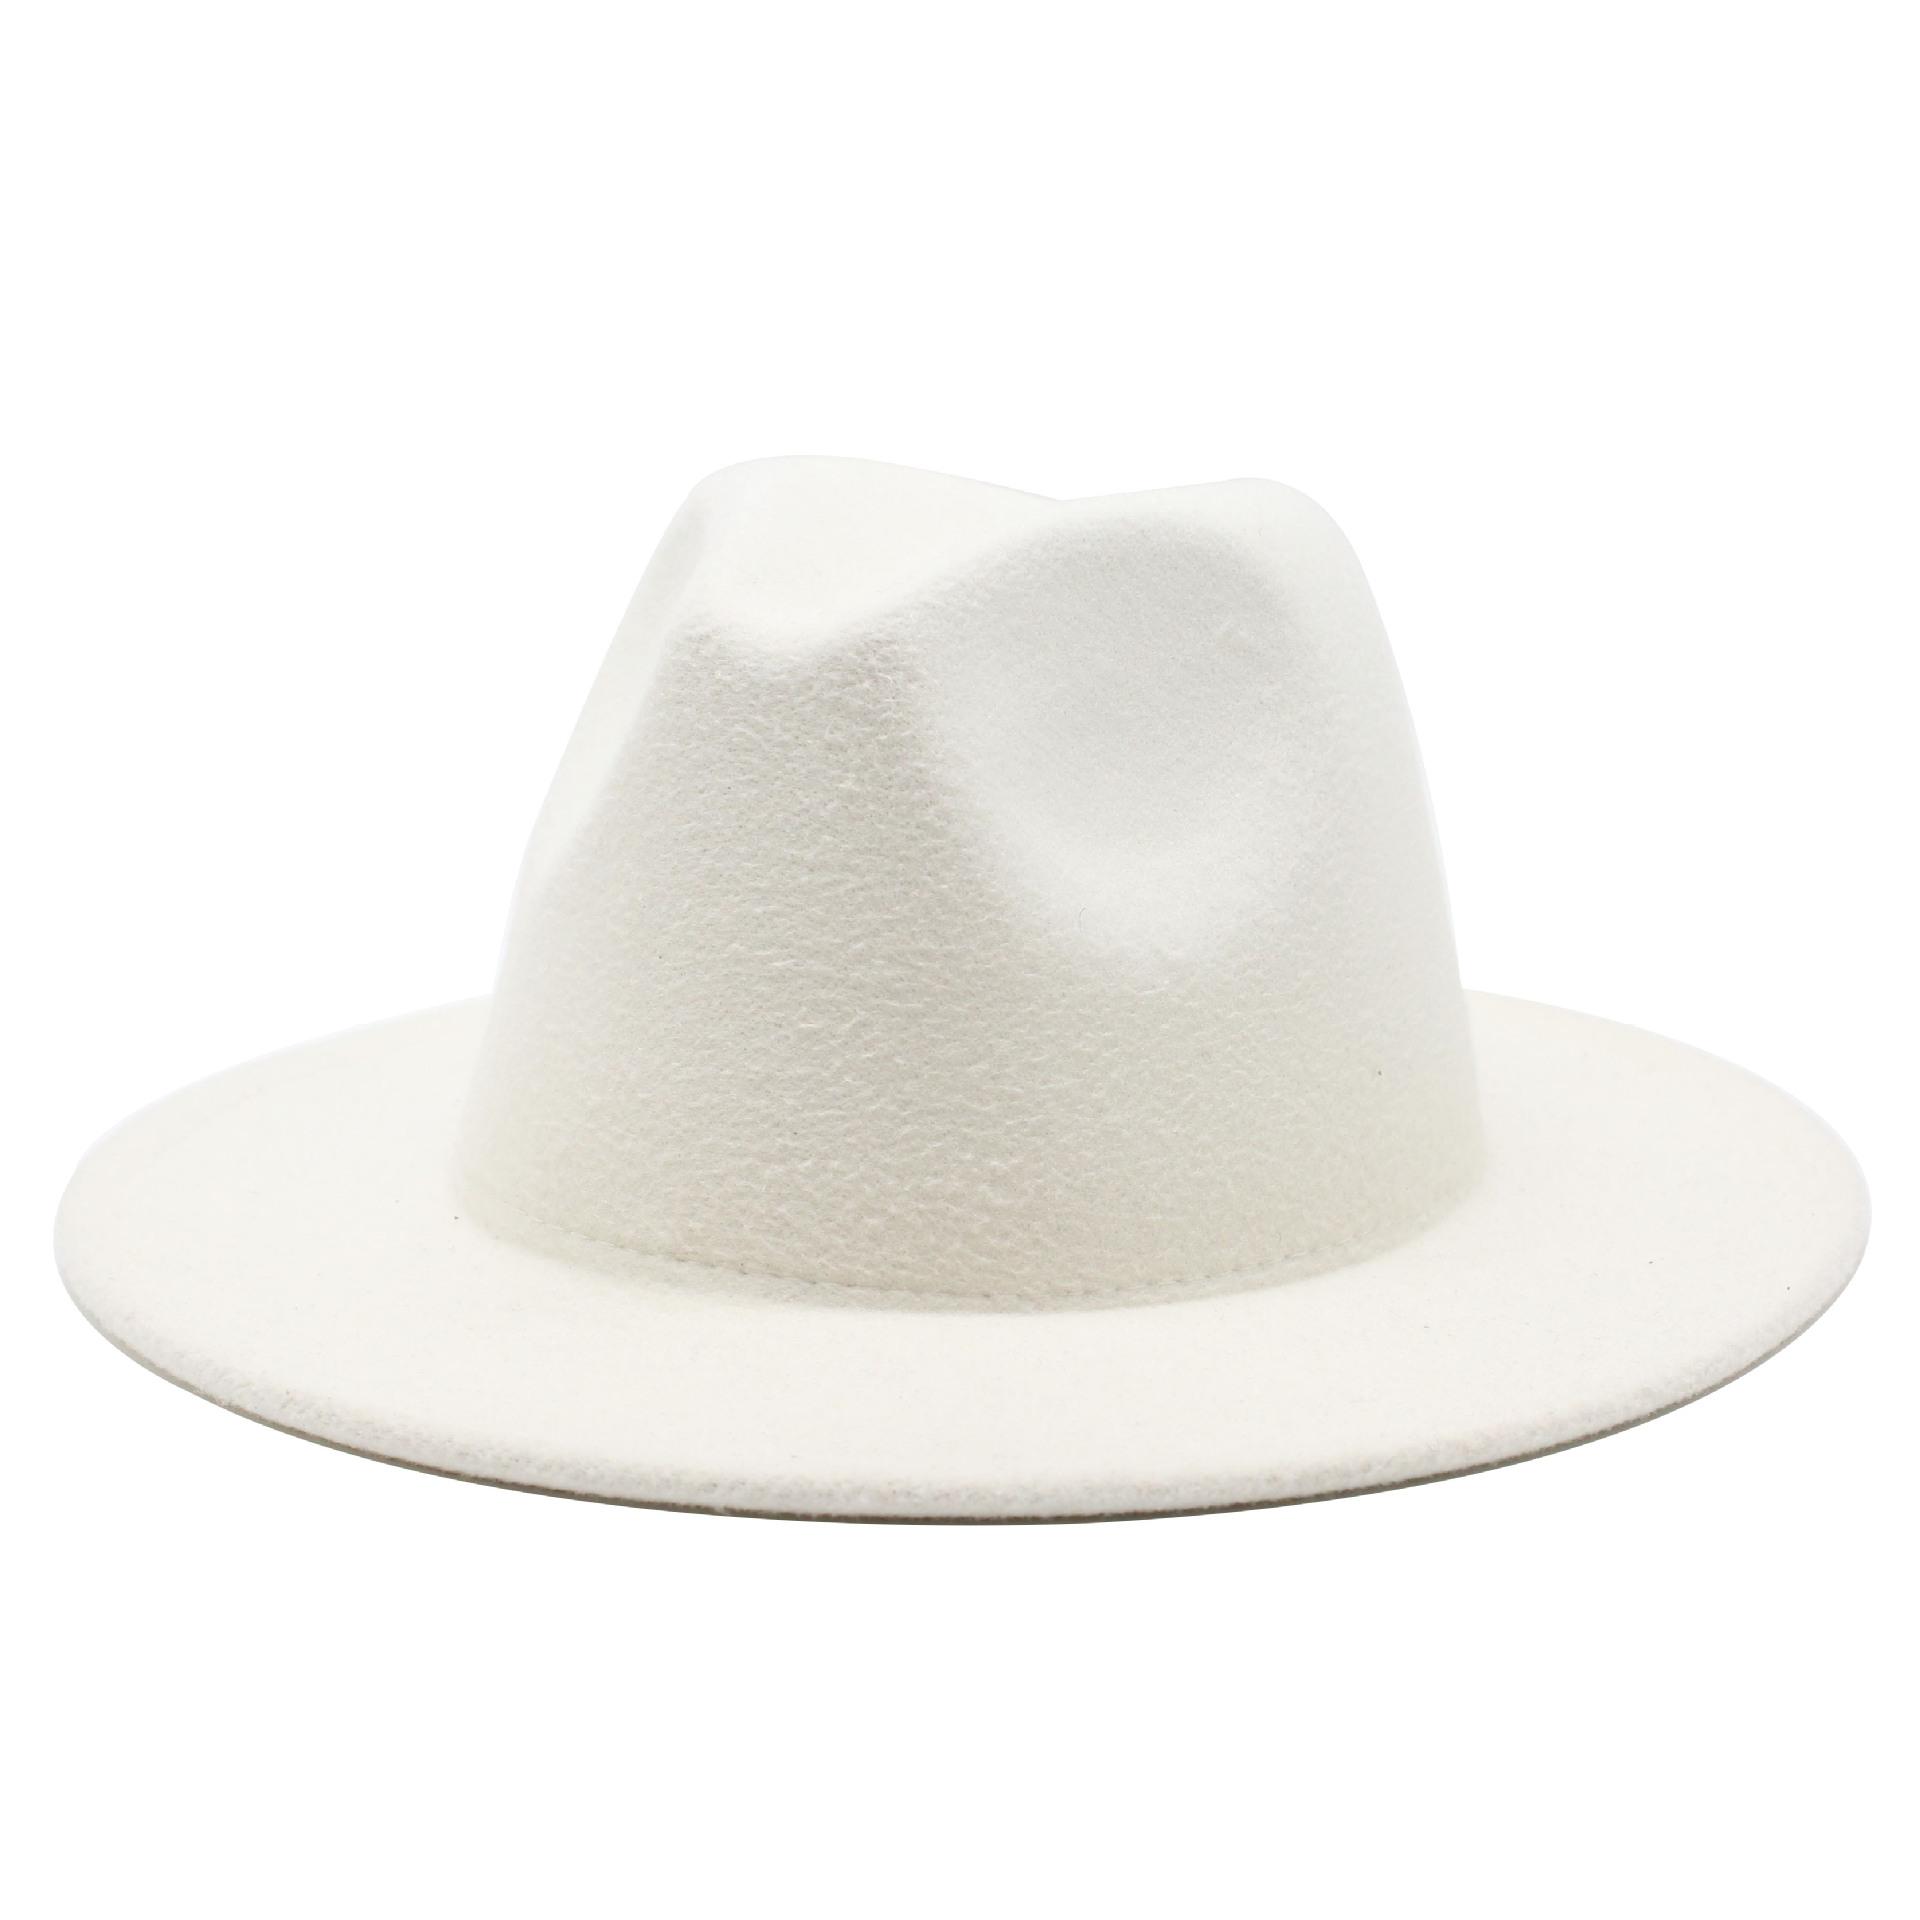 All match Wide Brim Fedora Hat For Women Solid Color Wool Felt Hat For Men Autumn Winter Panama Gamble Yellow Jazz Cap 56 61cm